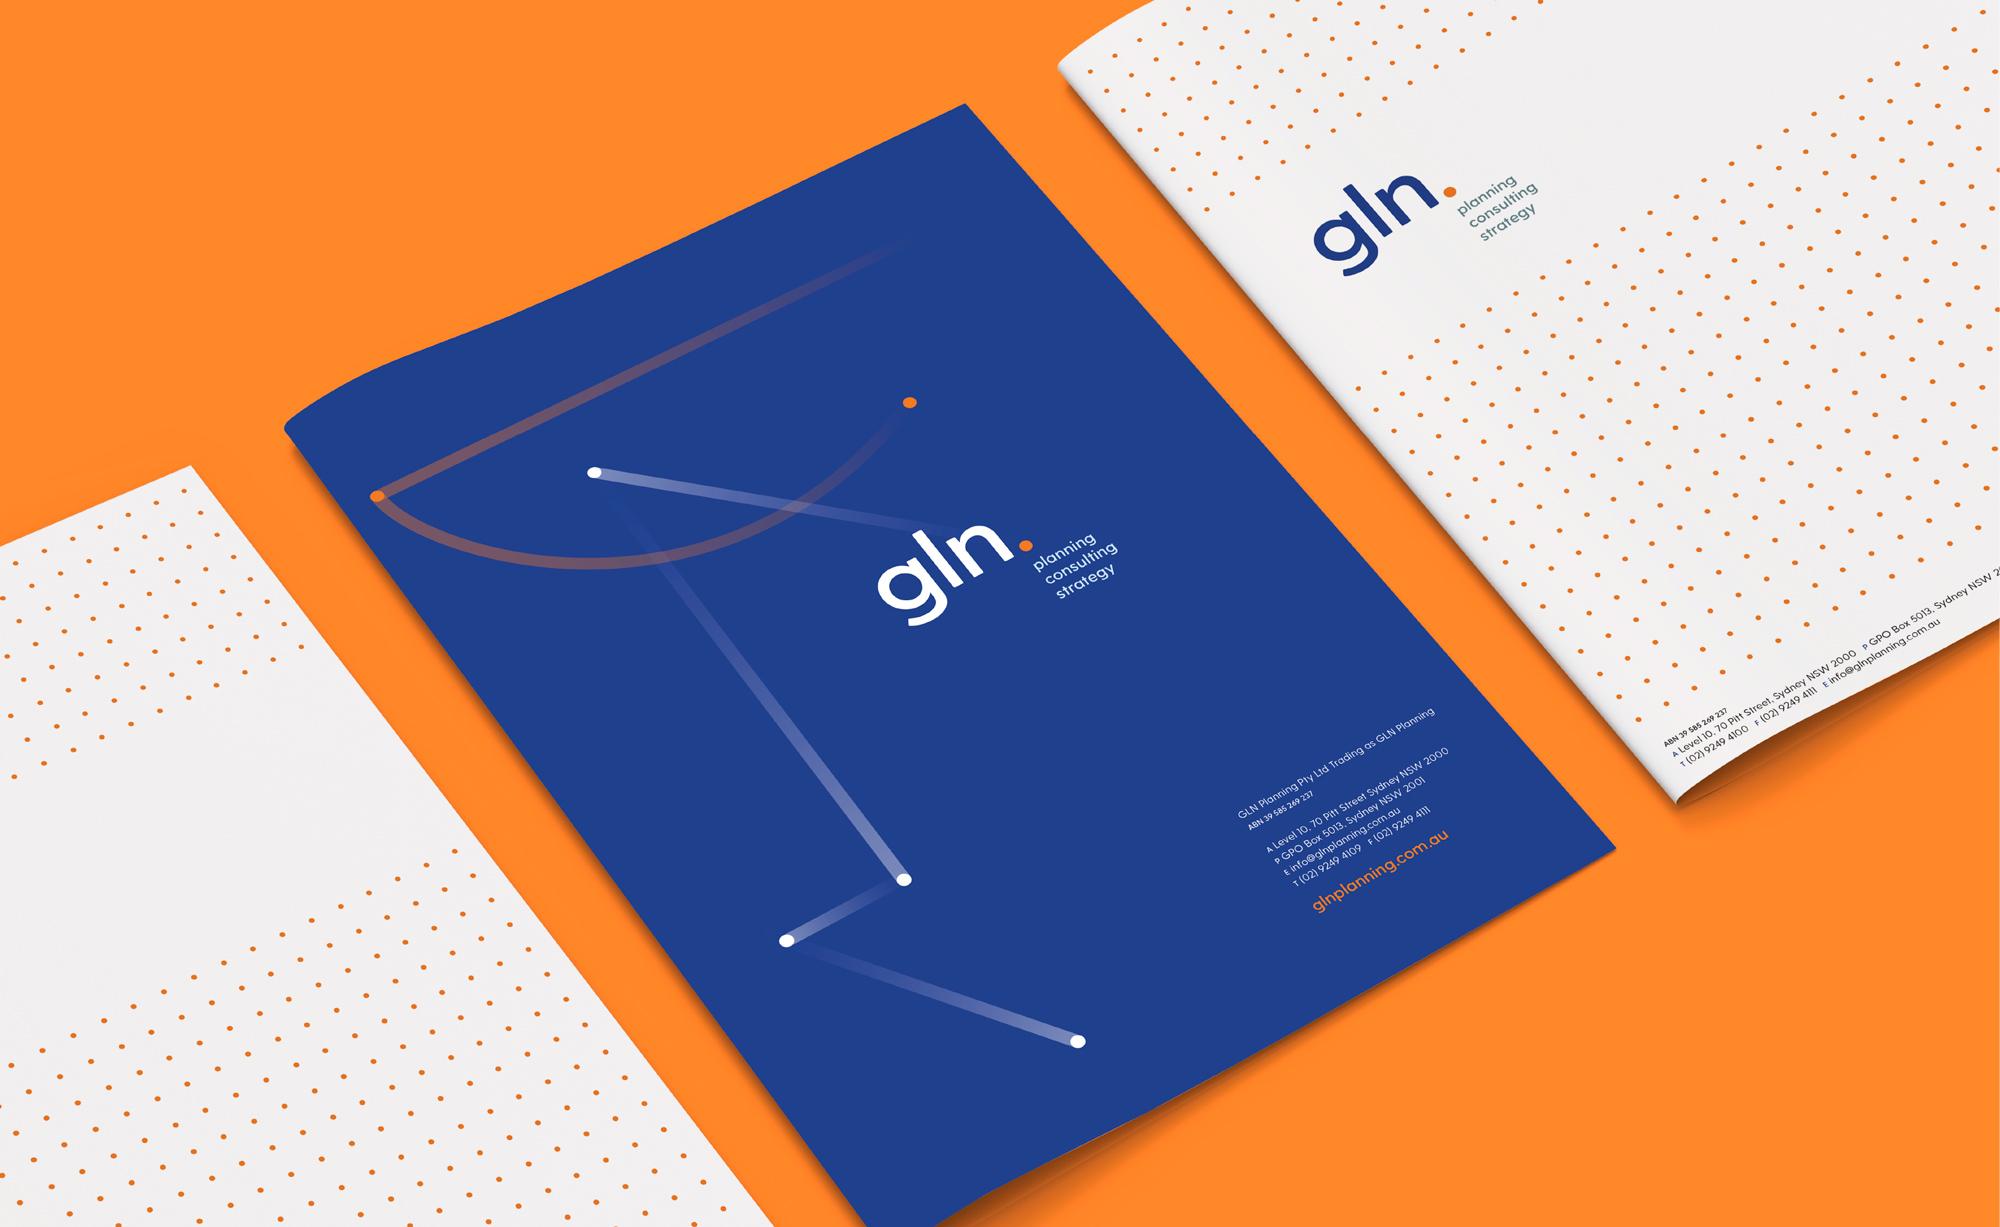 GLN_planning-design-branding-studio-5